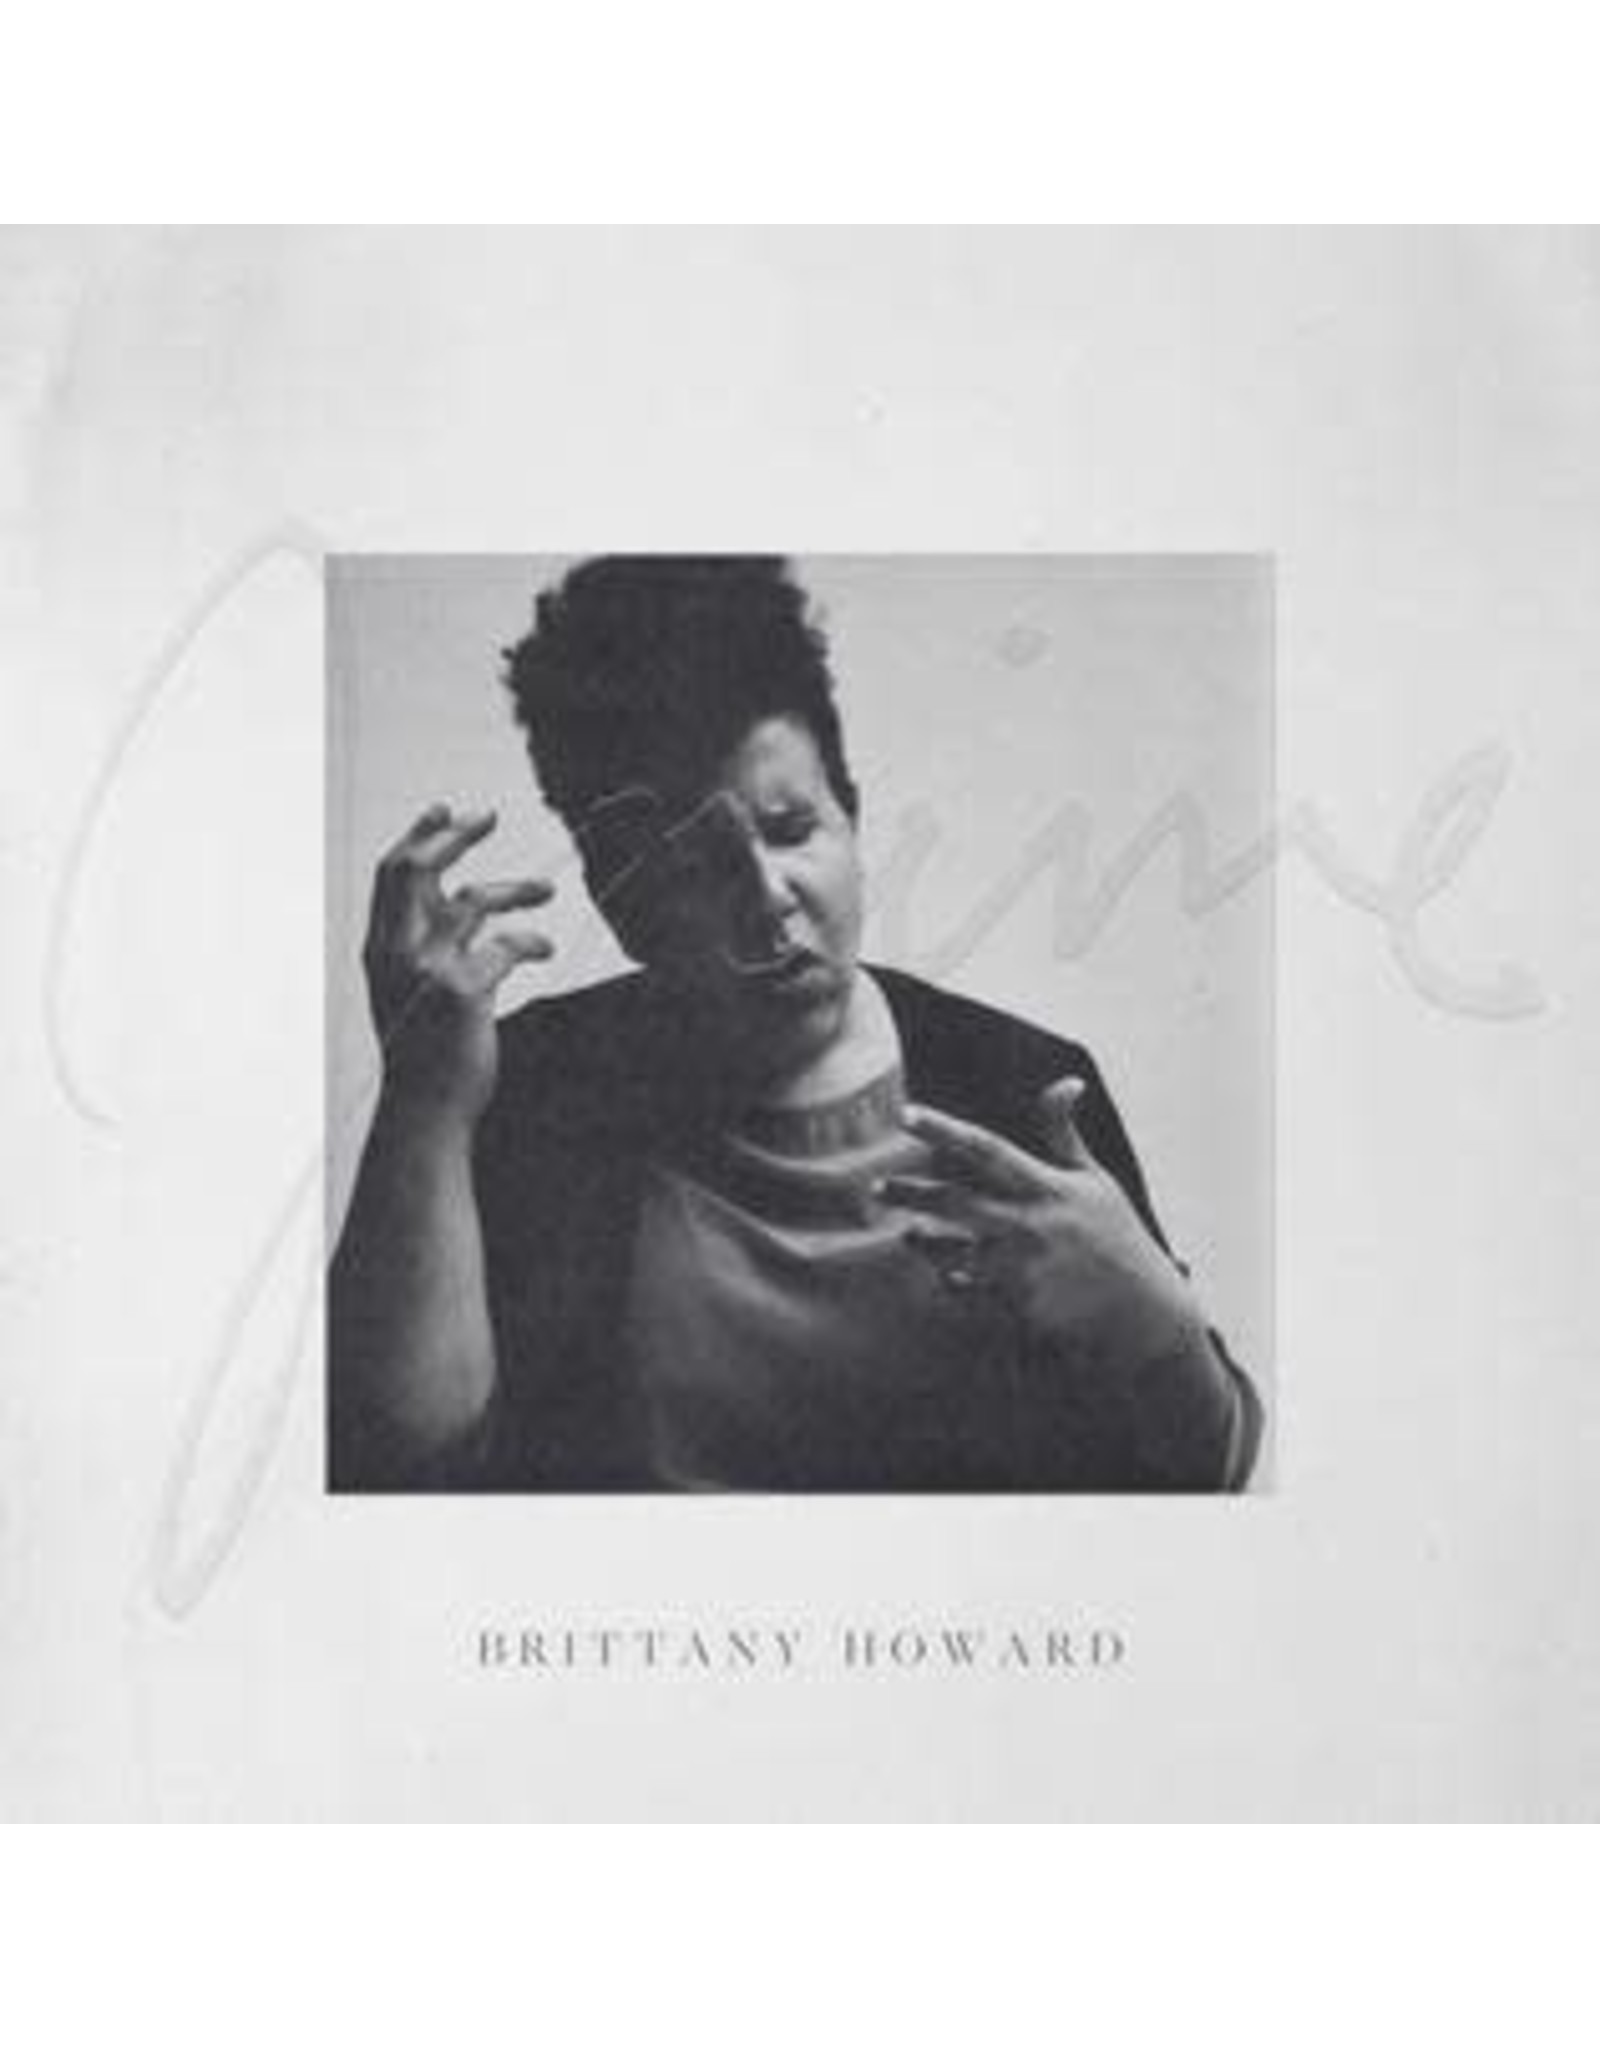 Howard,Brittany - Jaime (Deluxe Ltd LP marble vinyl)